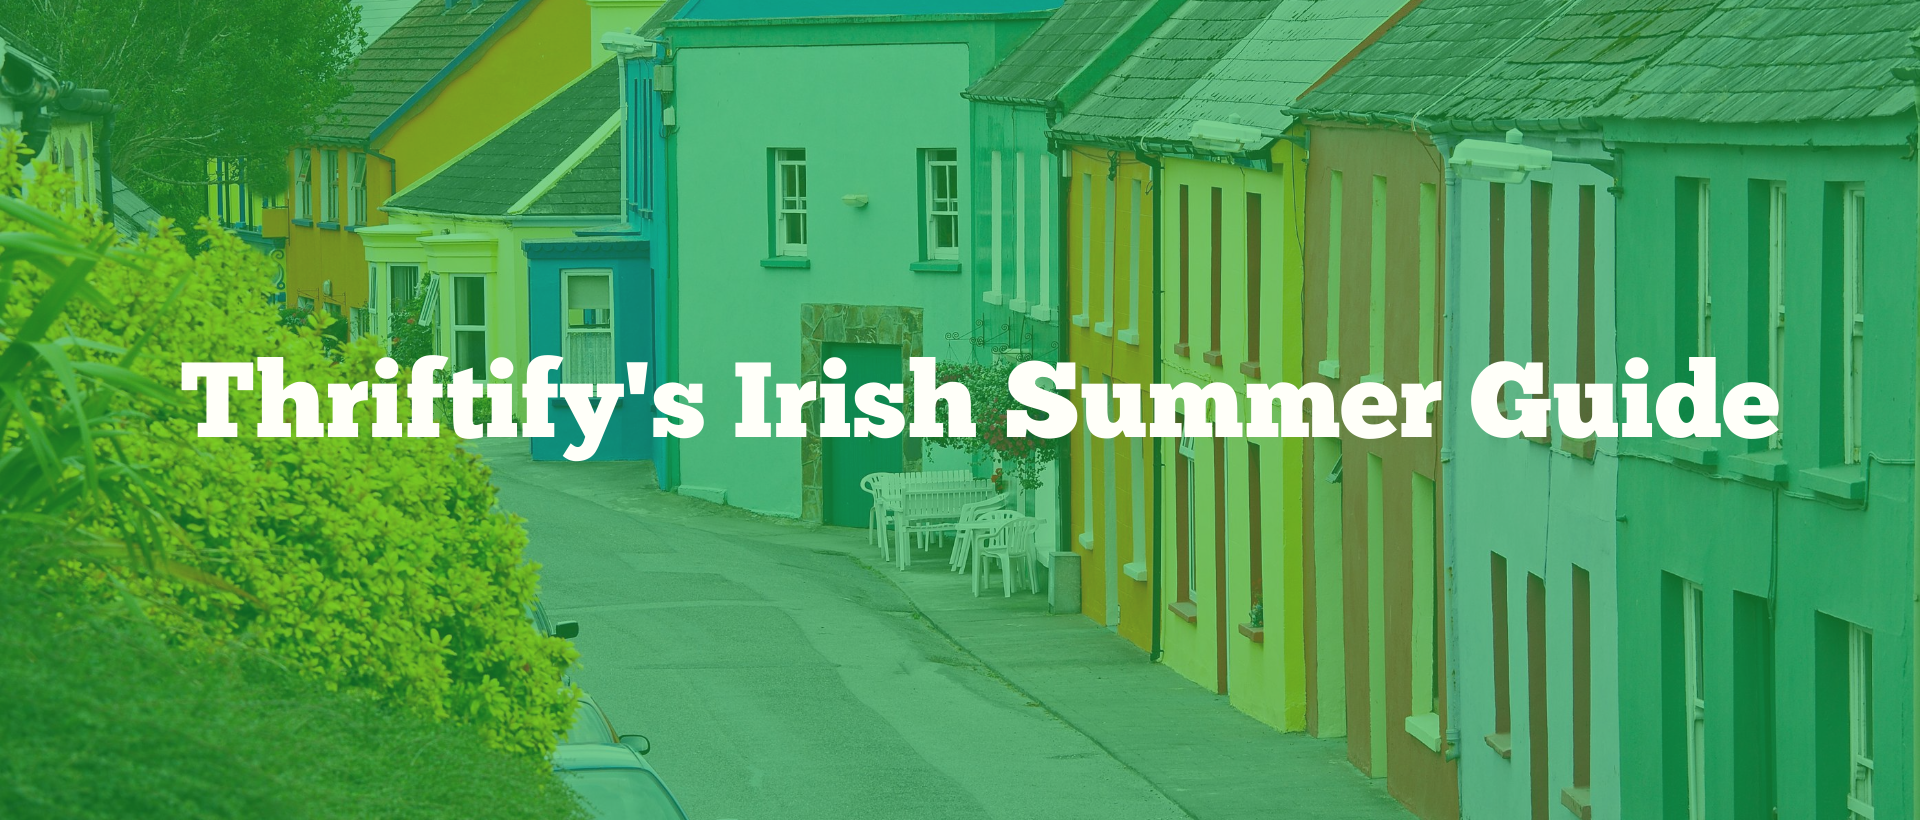 Thriftify's Irish Summer Guide